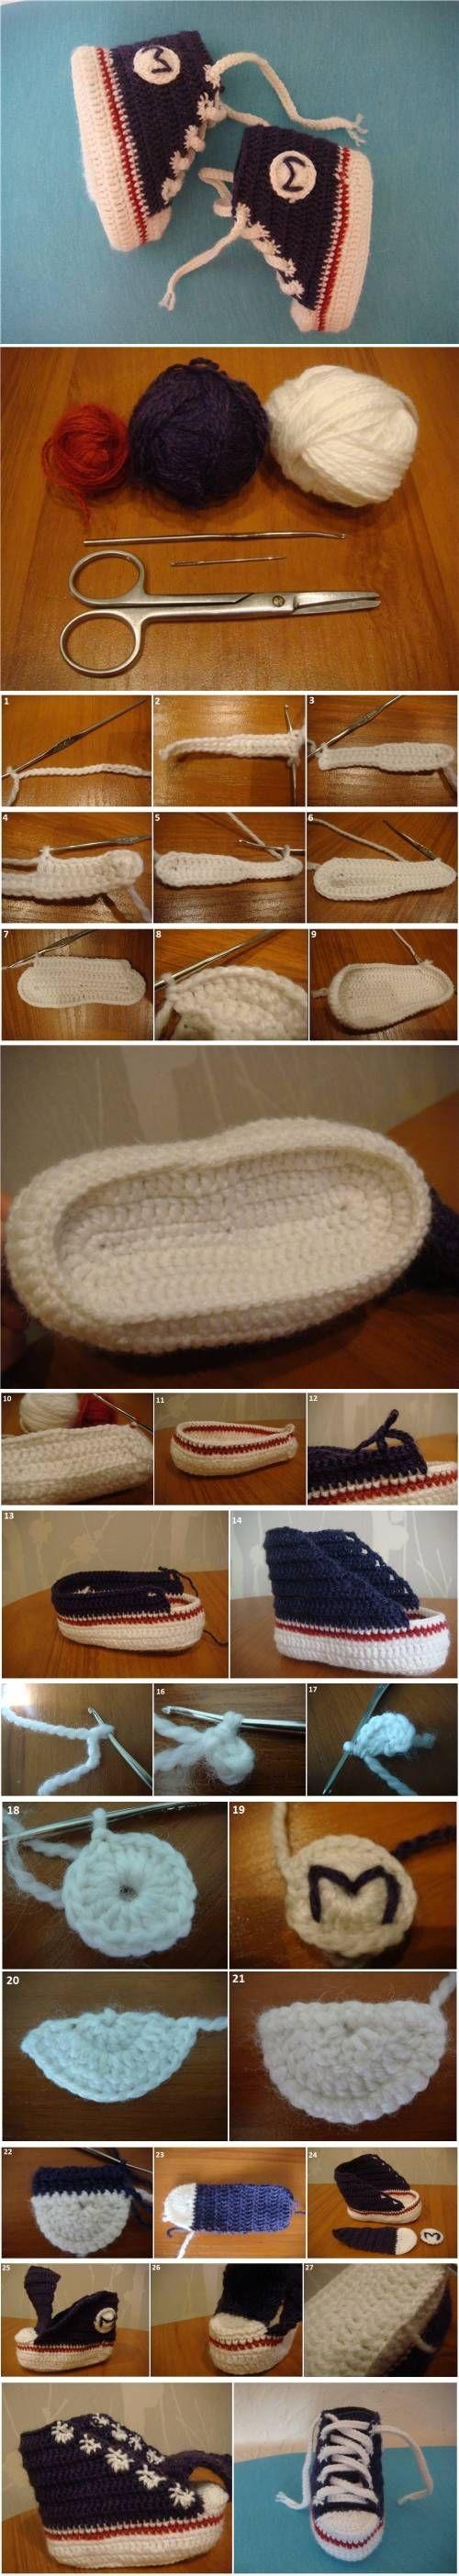 DIY Crochet Tennis Booties DIY Projects | UsefulDIY.com